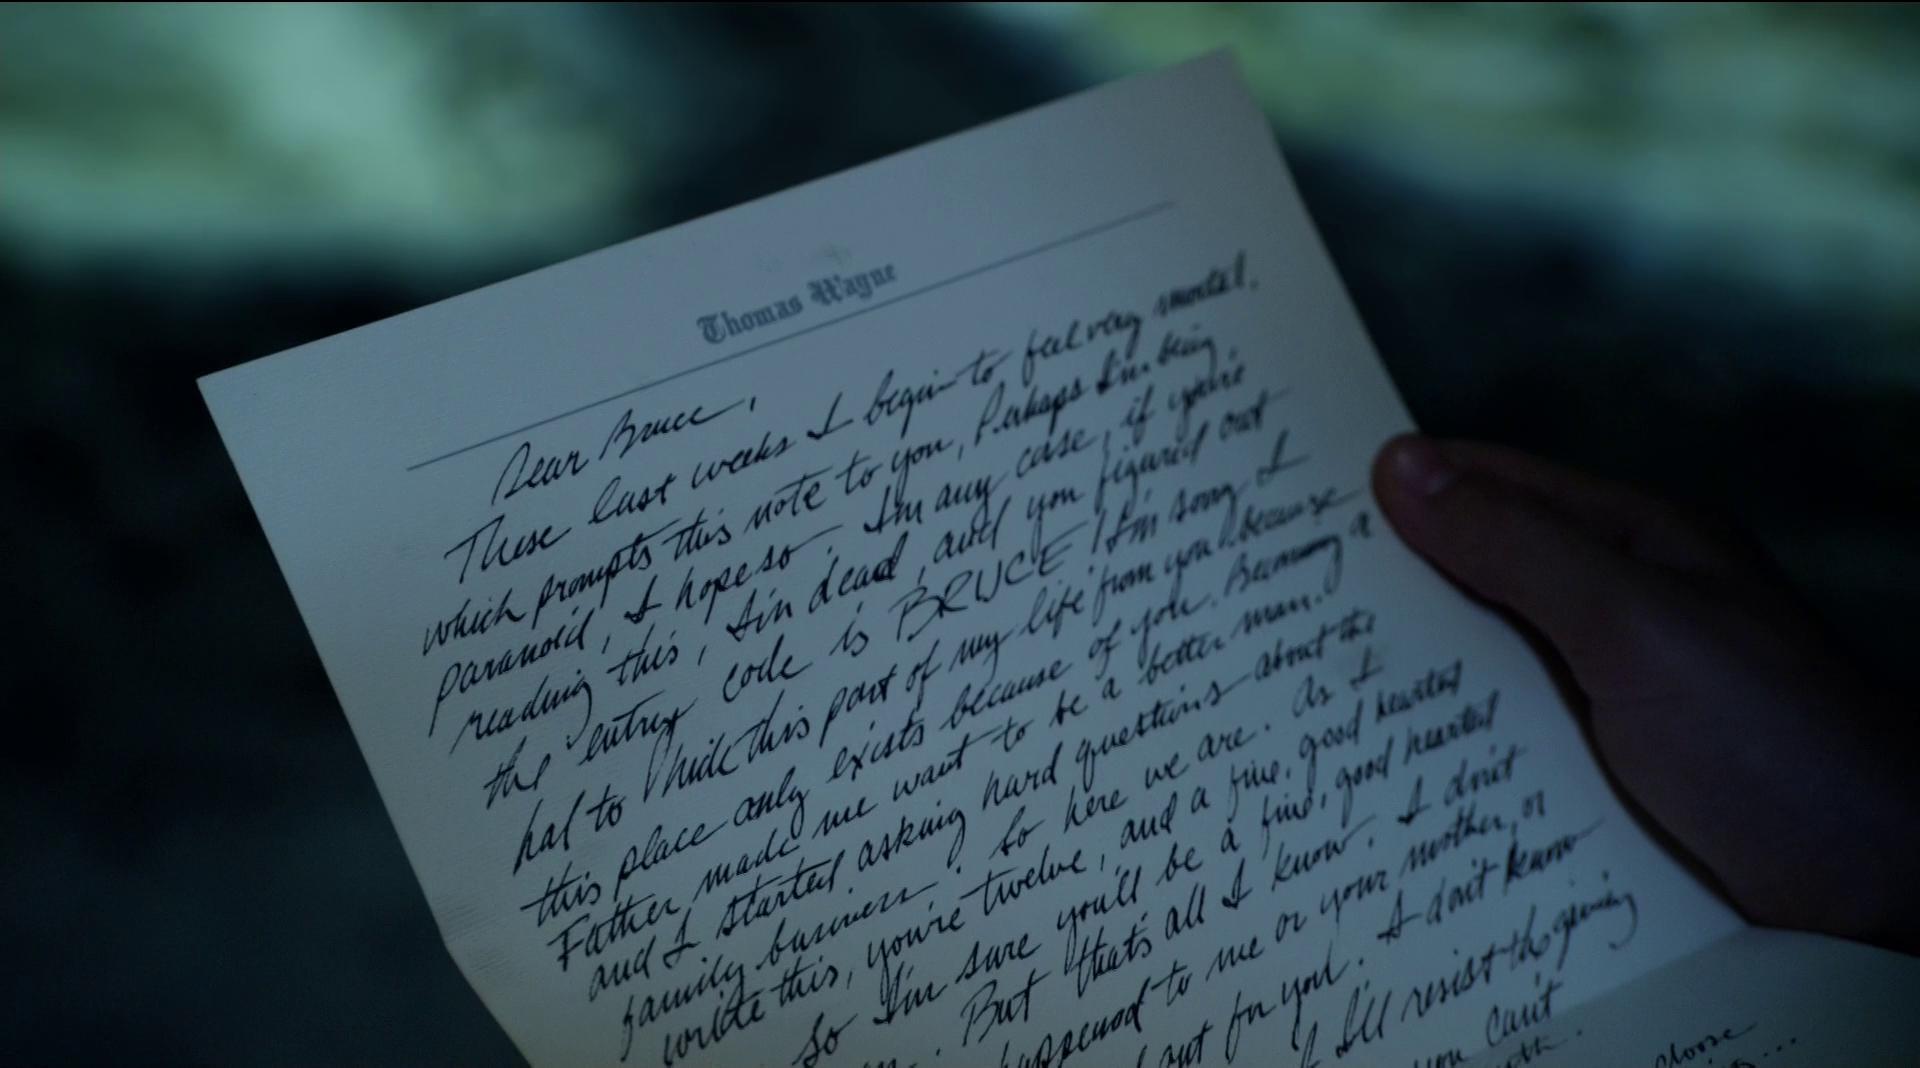 Thomas_Wayne's_letter